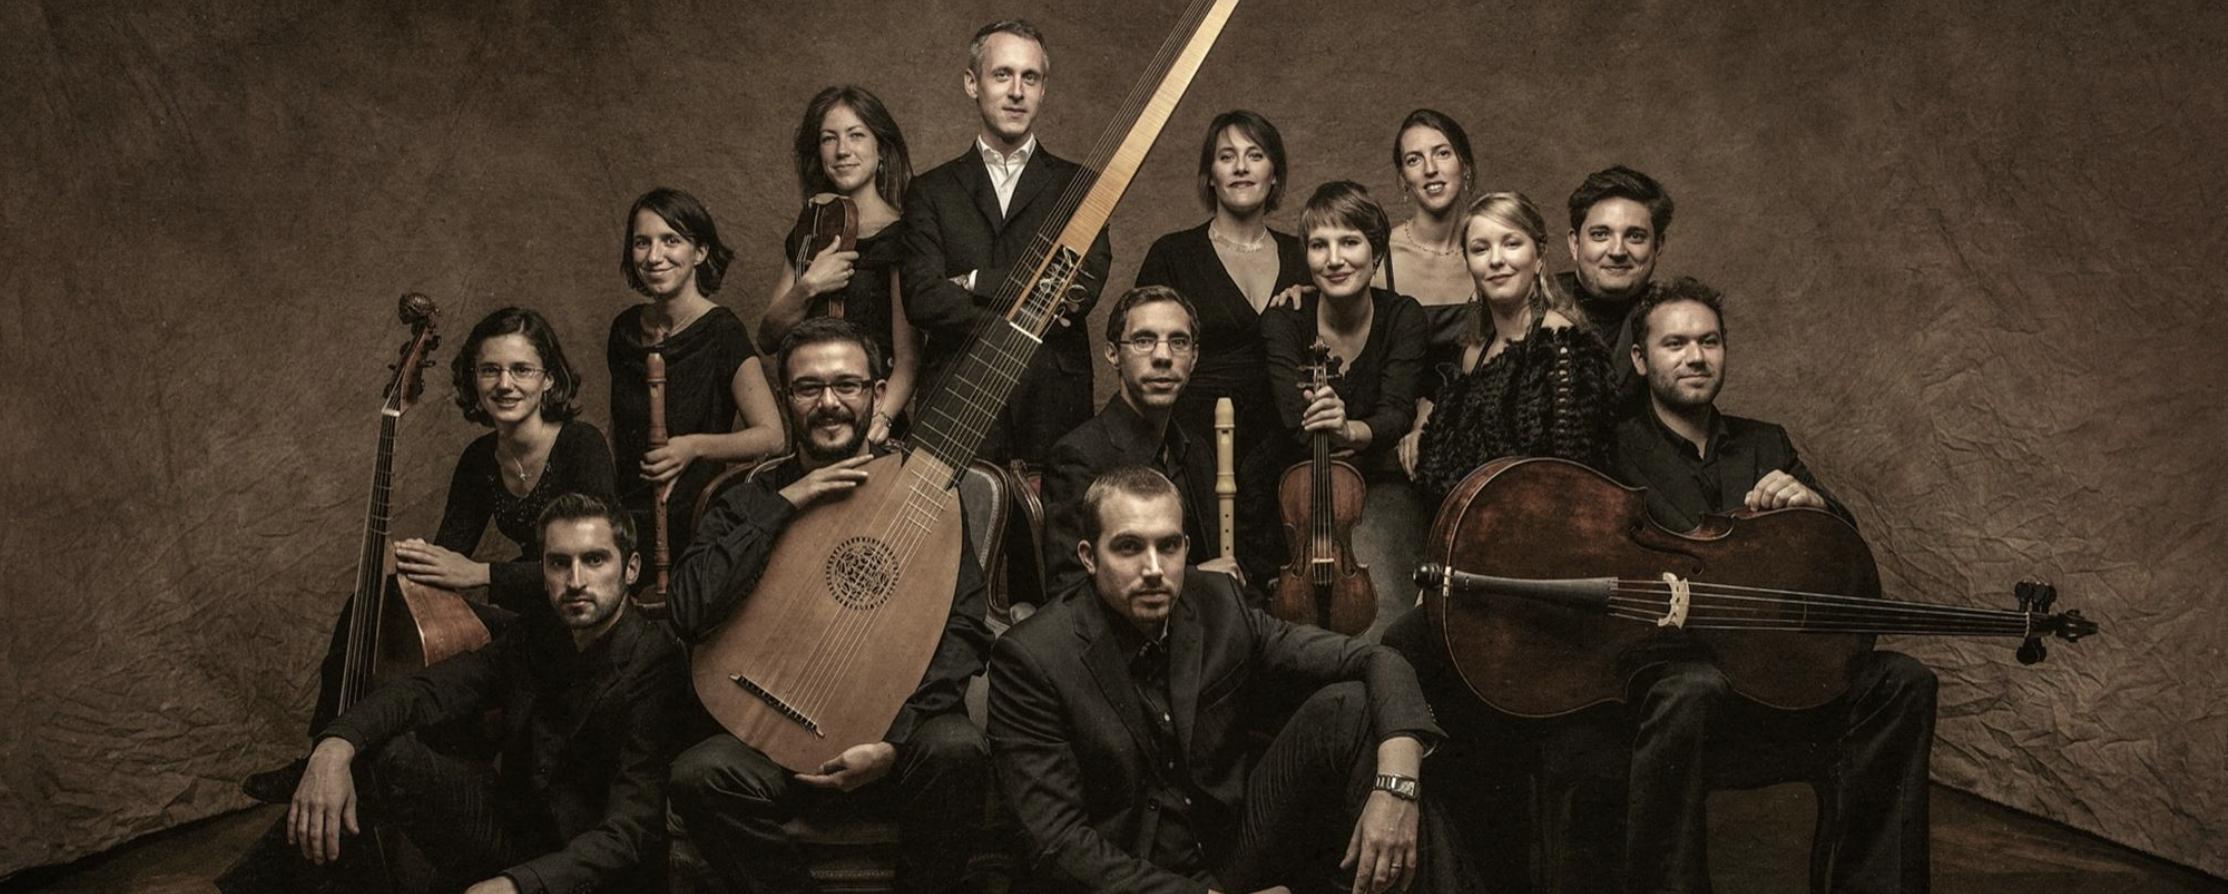 Festival oude muziek openingsconcert